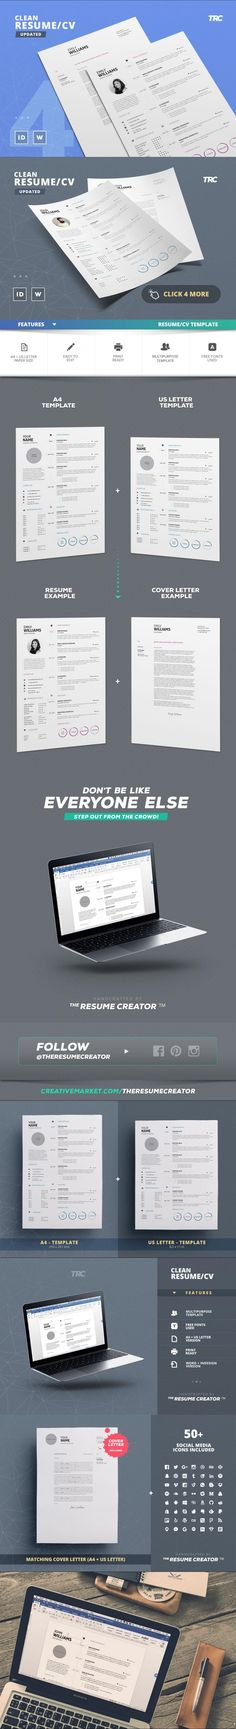 Clean Resume/Cv Template Volume 4 #CvTemplate #minimaltemplate #indesigntemplate #minimalist #swissresume #ResumeTemplateDownload #CurriculumVitae #ResumeTemplateDownload #stationery #professional #branding #CvDesign #usletter #minimal #customresume #customisableresume #resumecoverletter #usletter #easytocustomize Cv Template, Templates, Cv Design, Resume Cv, A4, Blue, Resume, Stencils, Design Resume